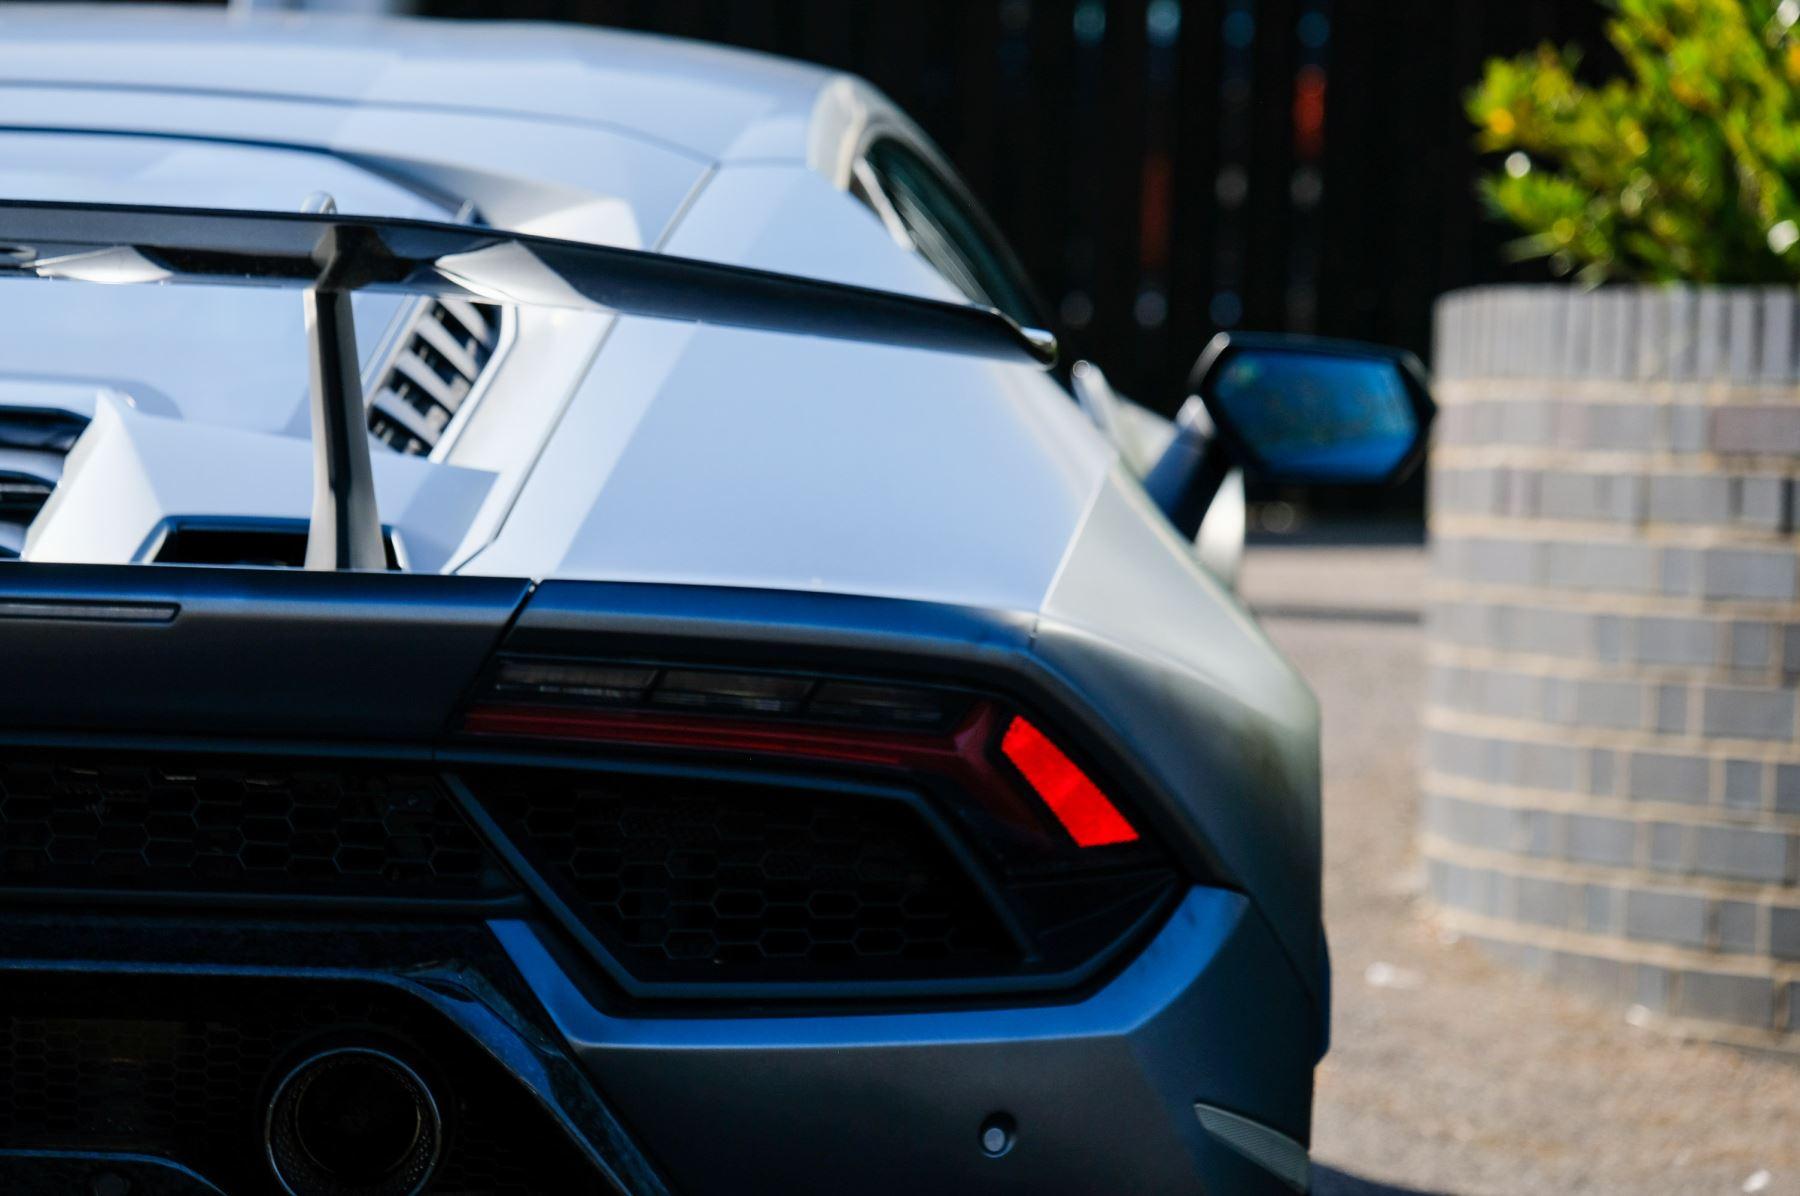 Lamborghini Huracan Performante LP 640-4 2dr LDF - Carbon Ceramic Brakes - Carbon Fiber Features - Comfort Seats image 11